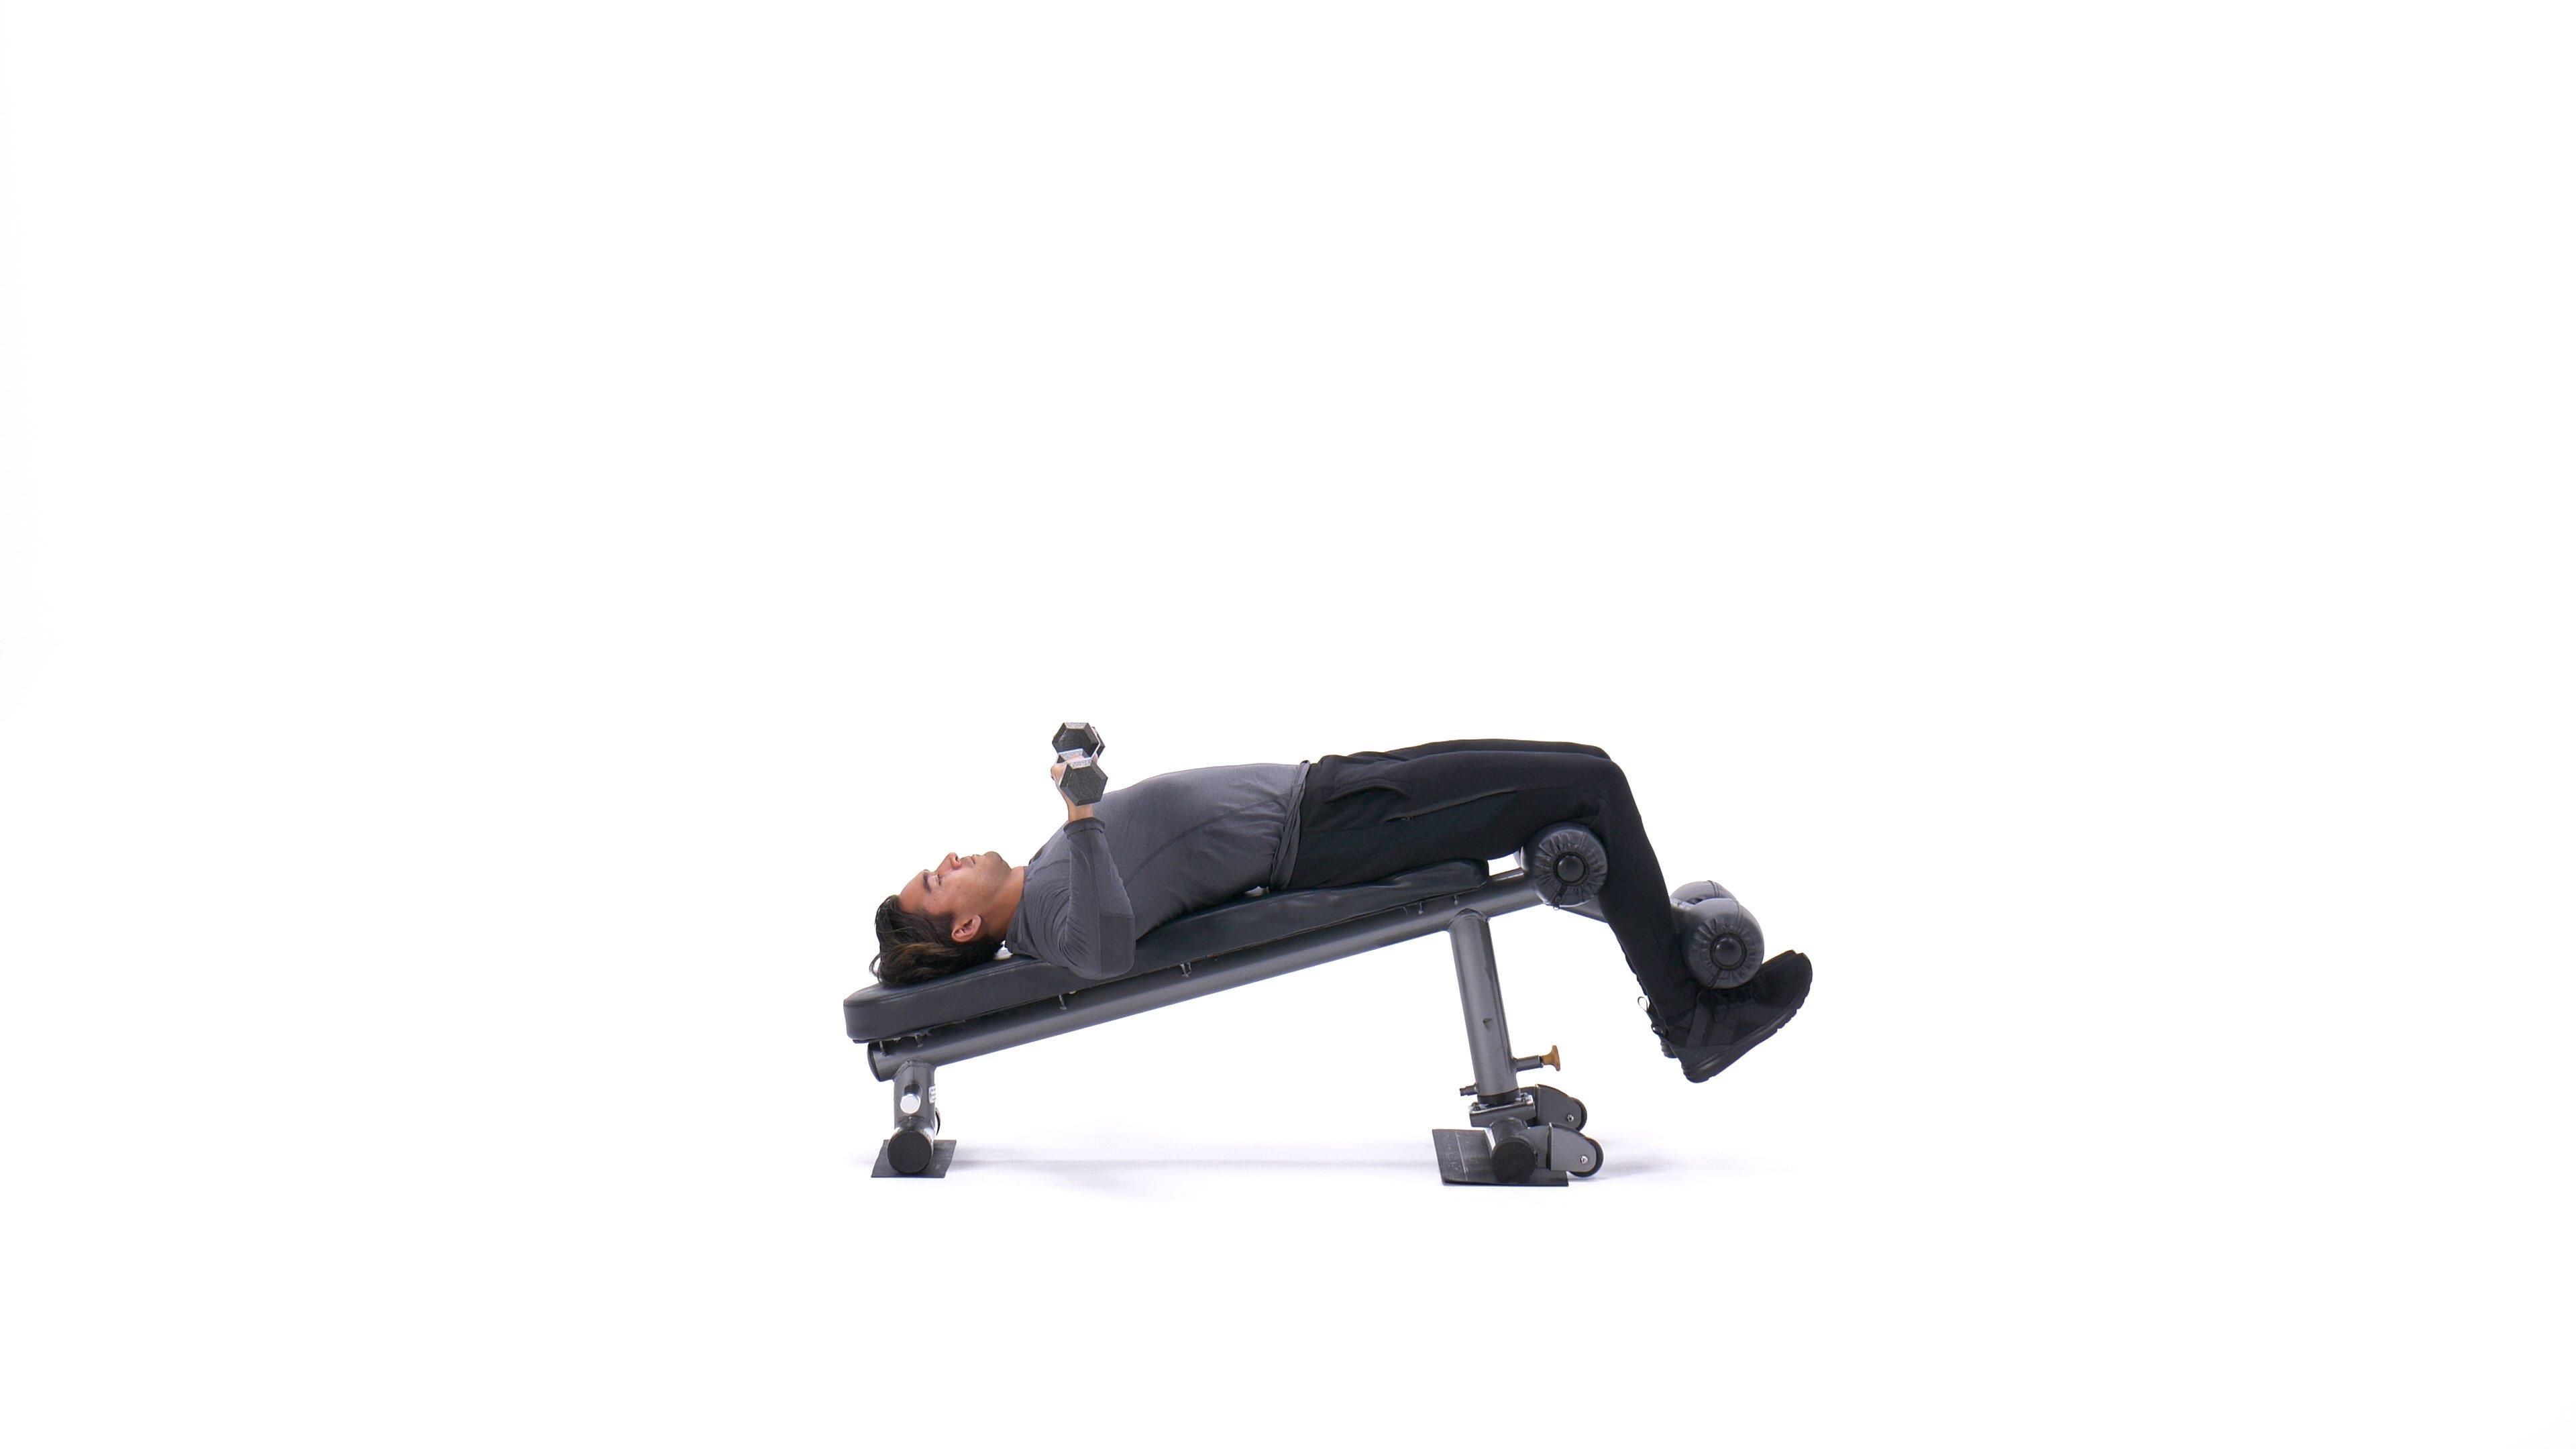 Decline dumbbell bench press image